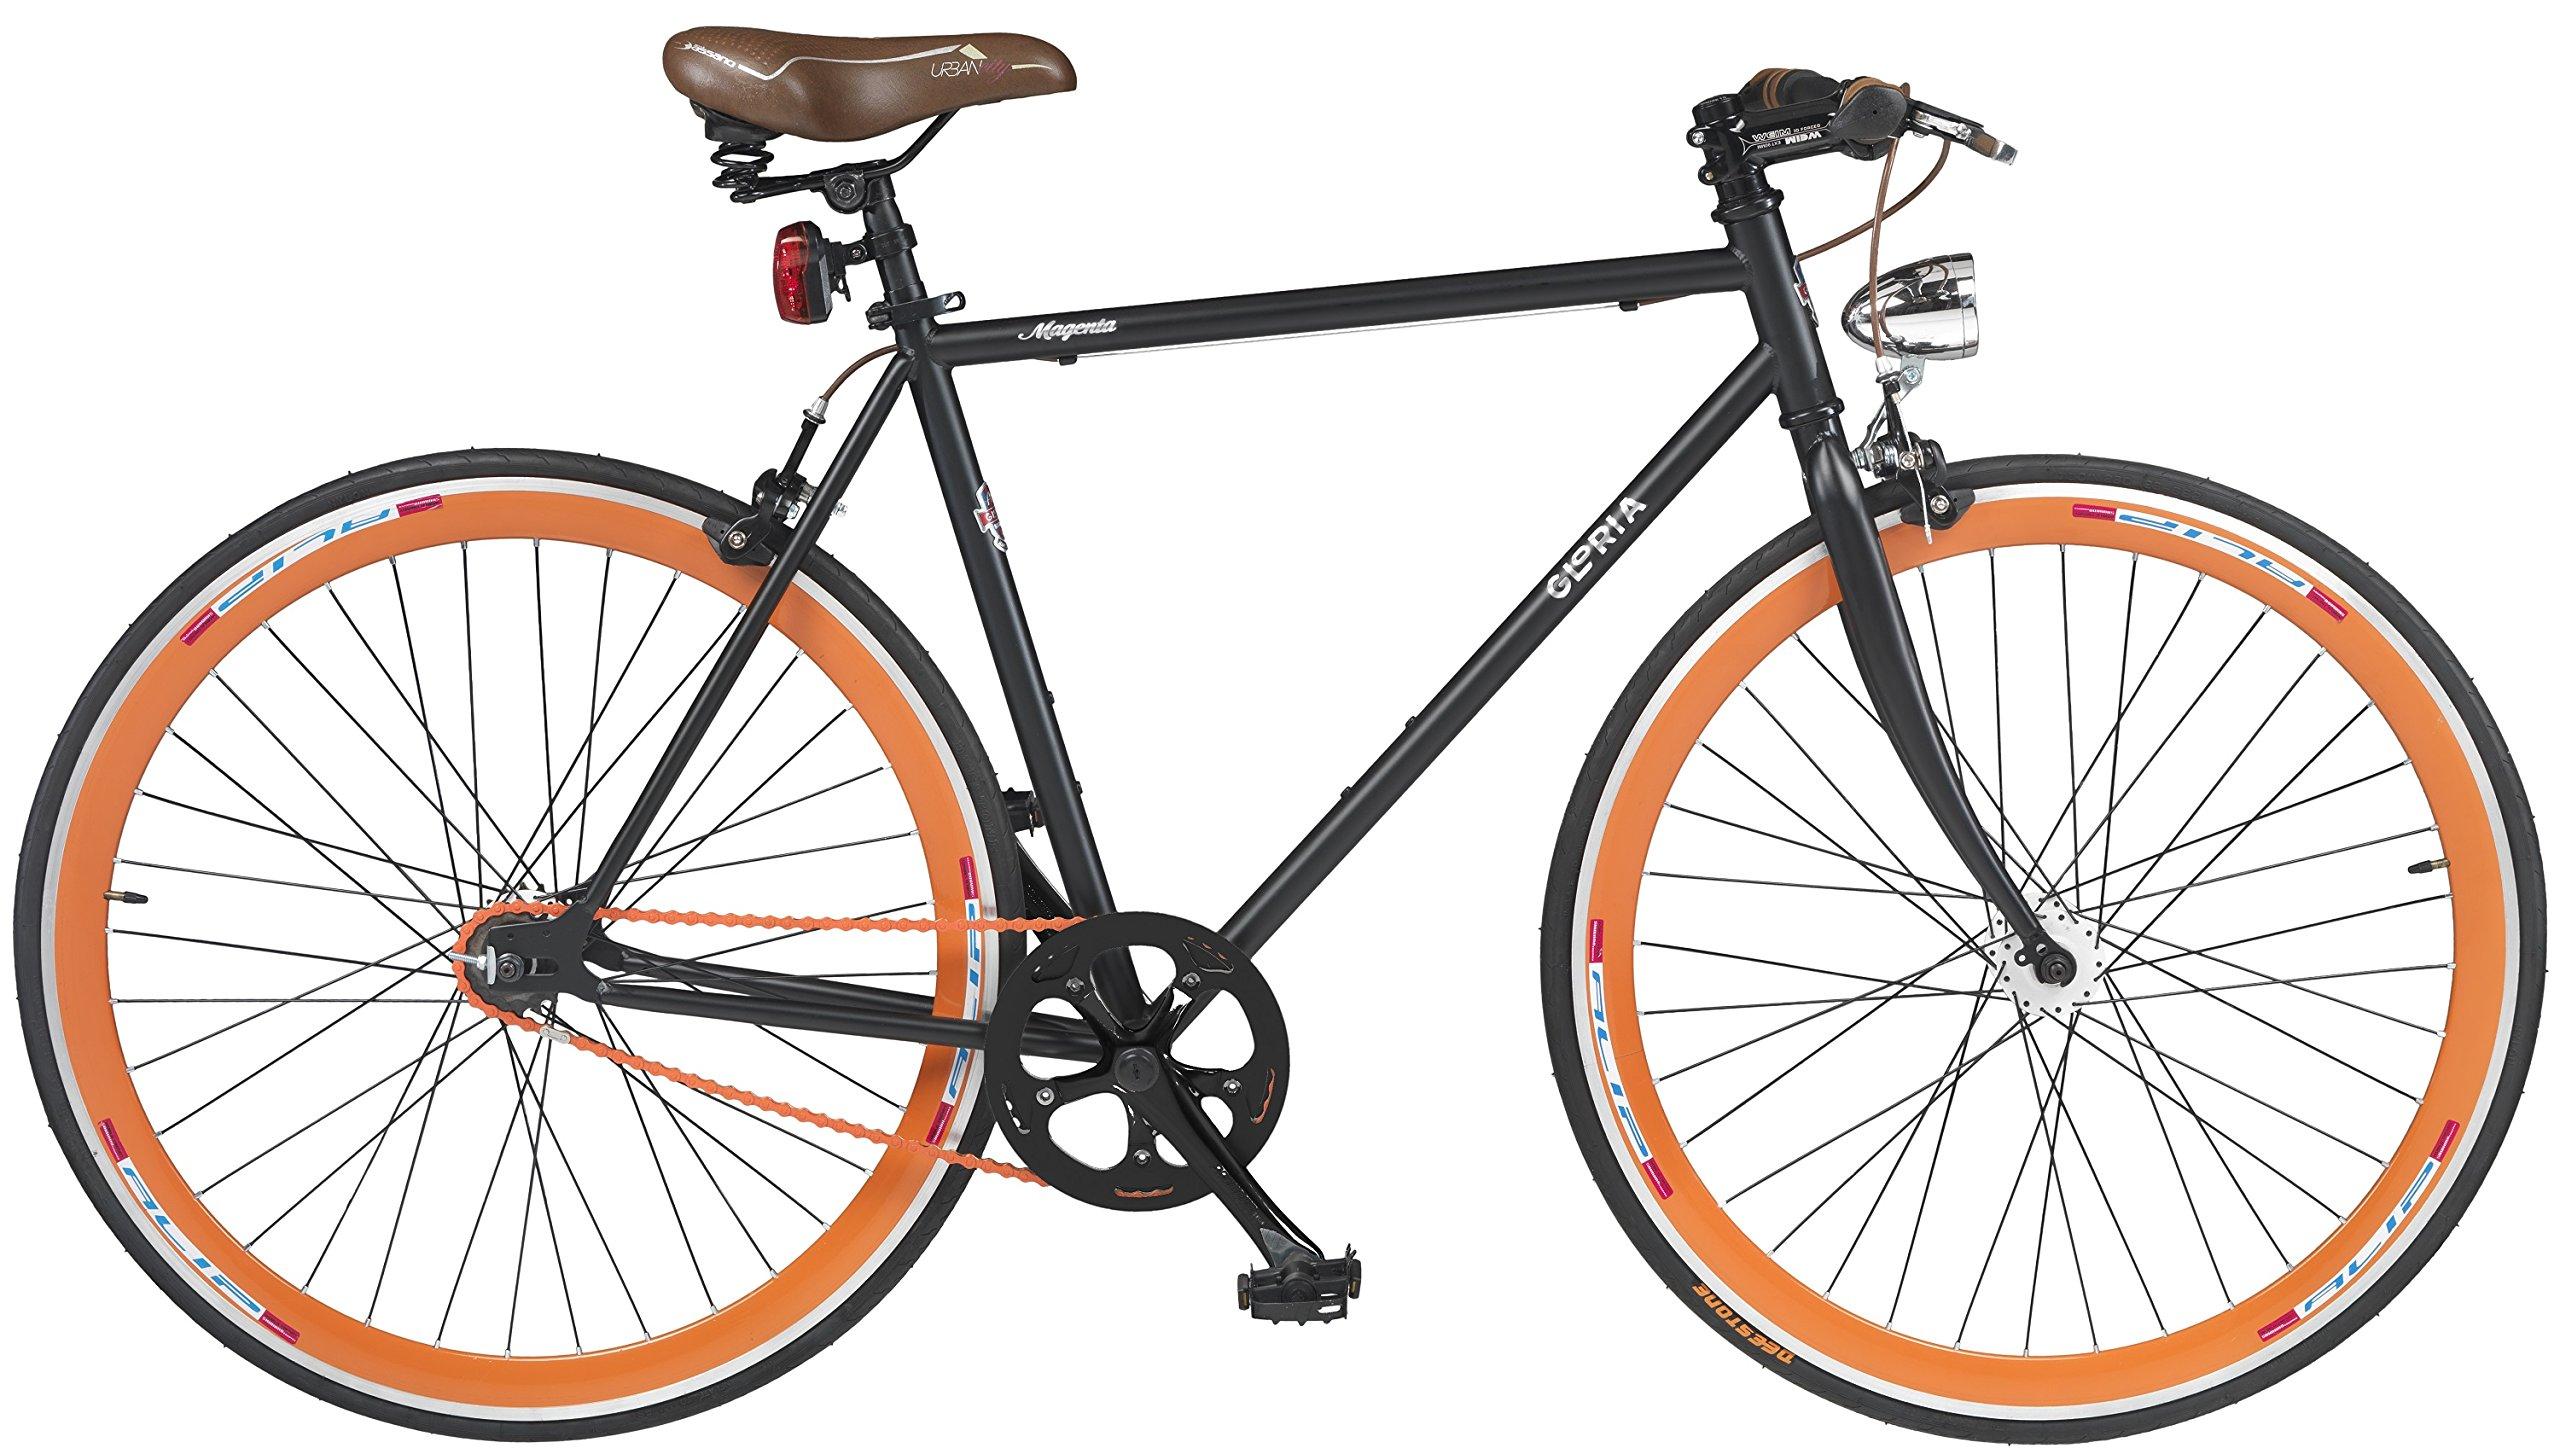 28 pulgadas Gloria Magenta Fixie Bicicleta: Amazon.es: Deportes y ...